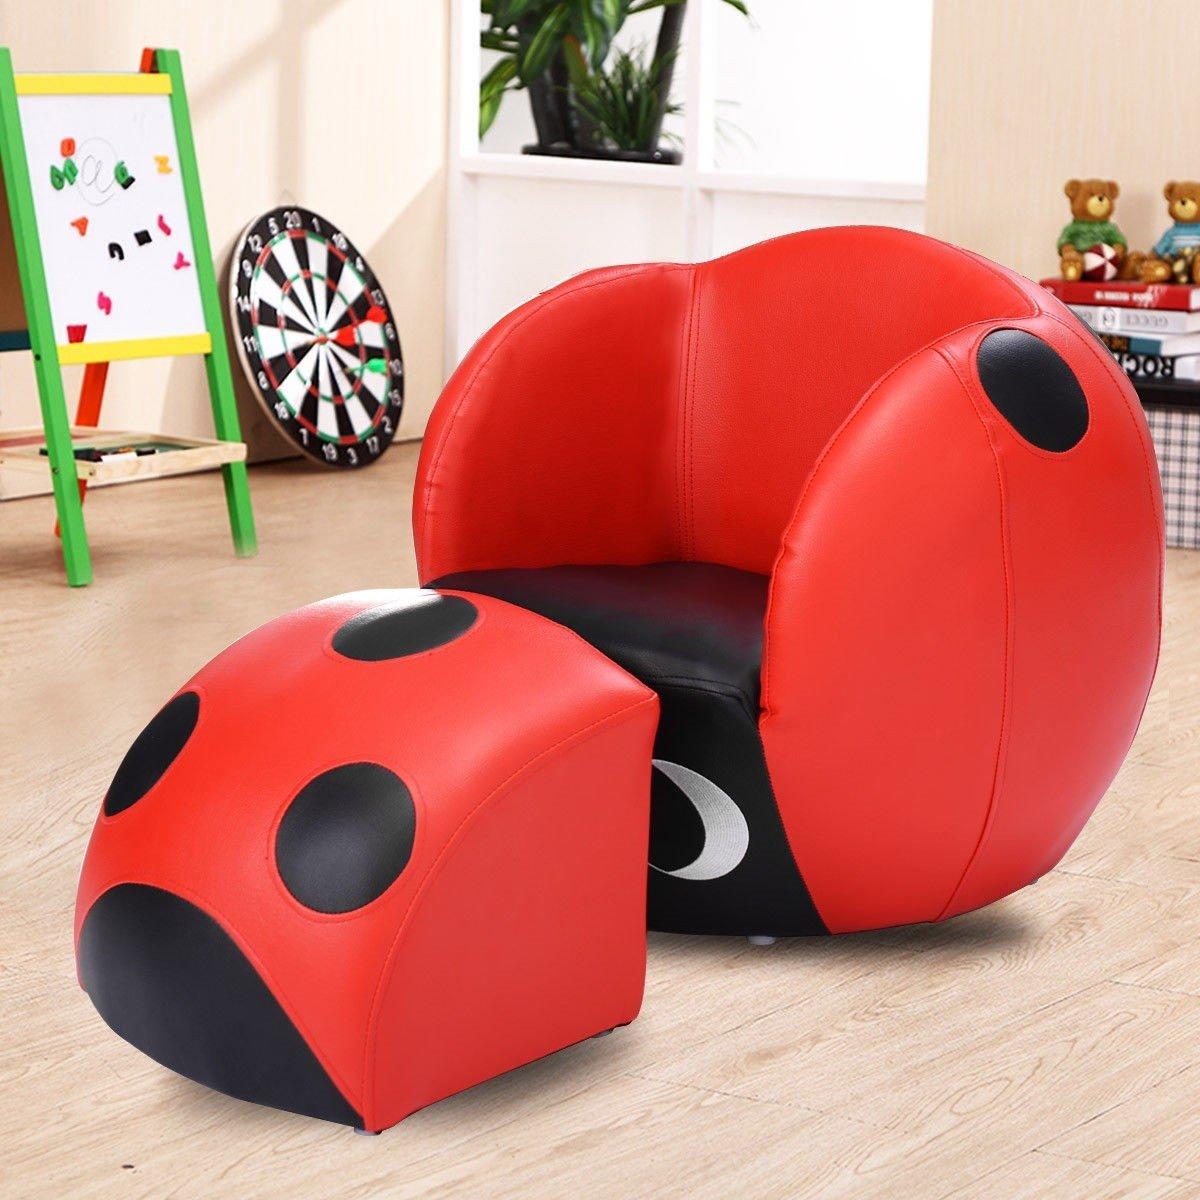 GentleShower Kids Ladybug Sofa Chair with Ottoman for Child's Bedroom Playroom, Space-saving Kids Chair with Footstool Single Seat Sofa